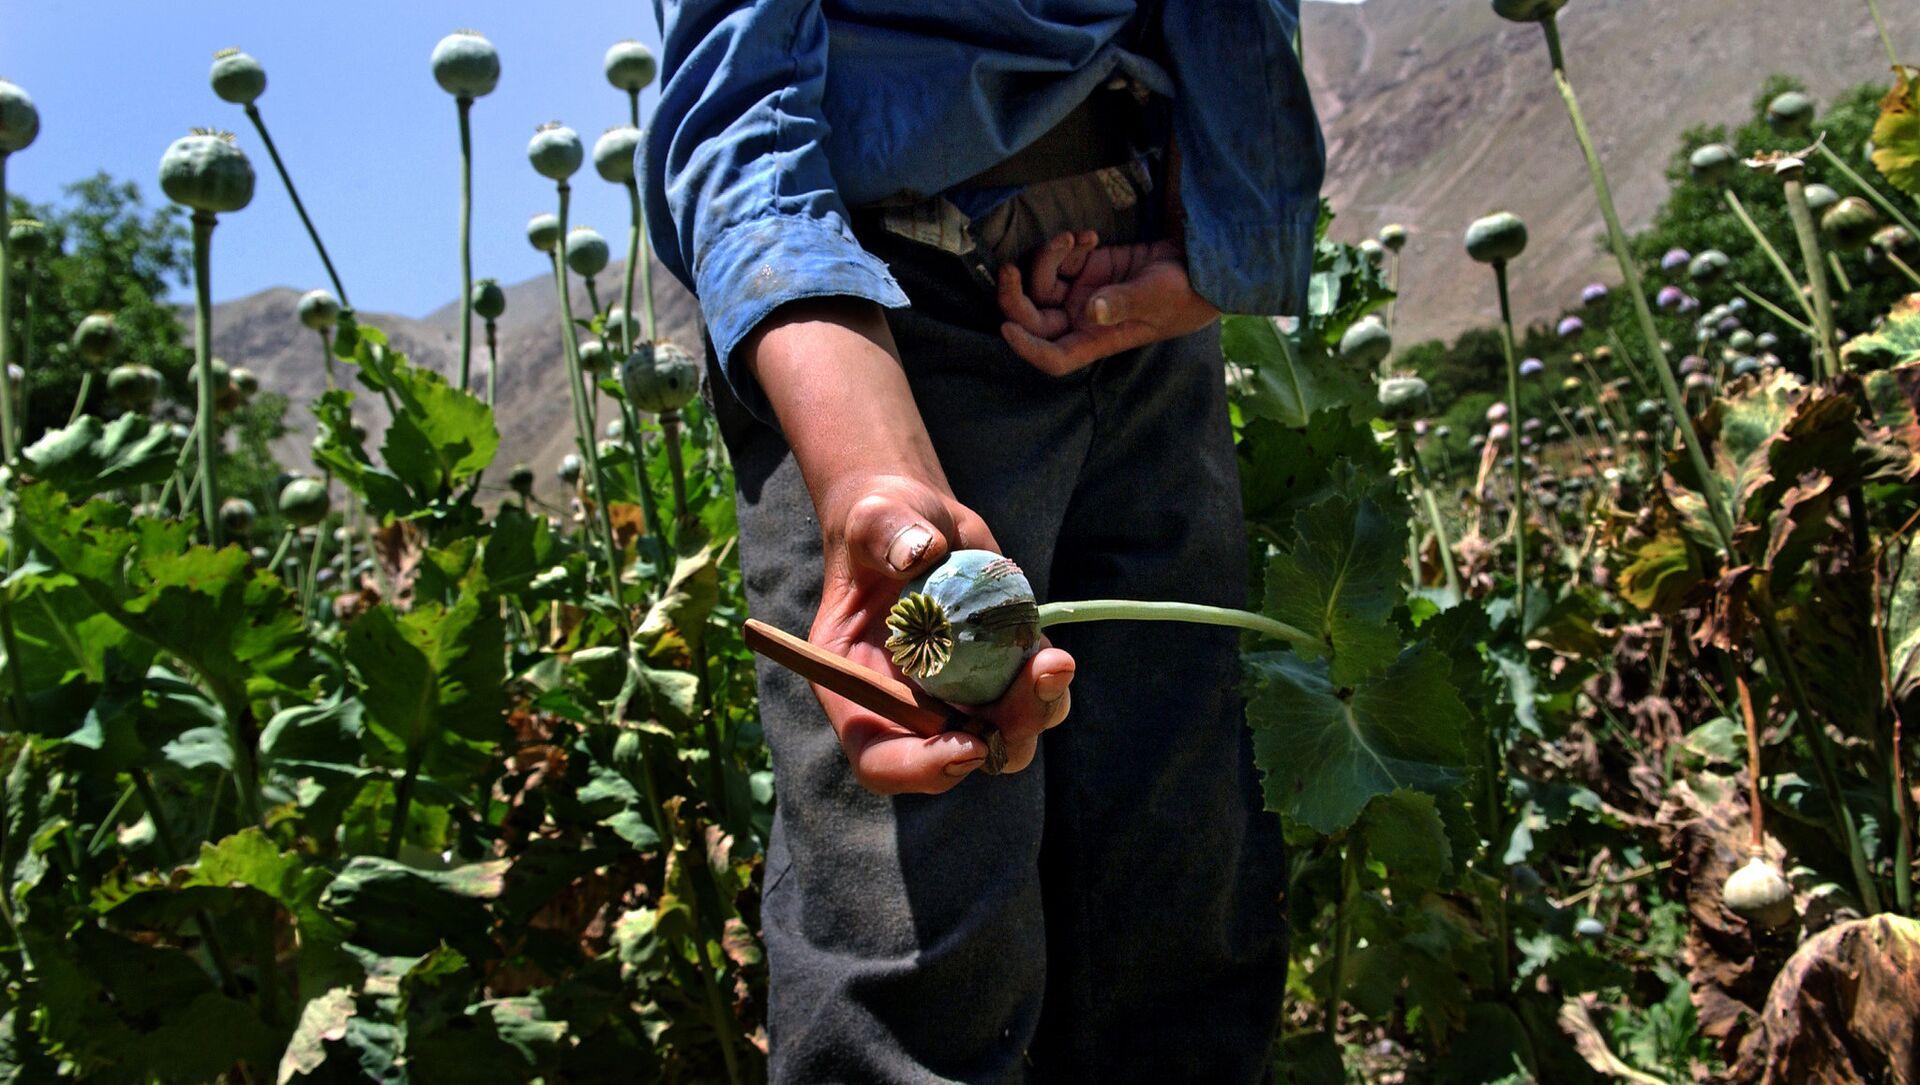 NATO mission fails to cripple opium trade in Afghanistan: expert - Sputnik International, 1920, 29.08.2021